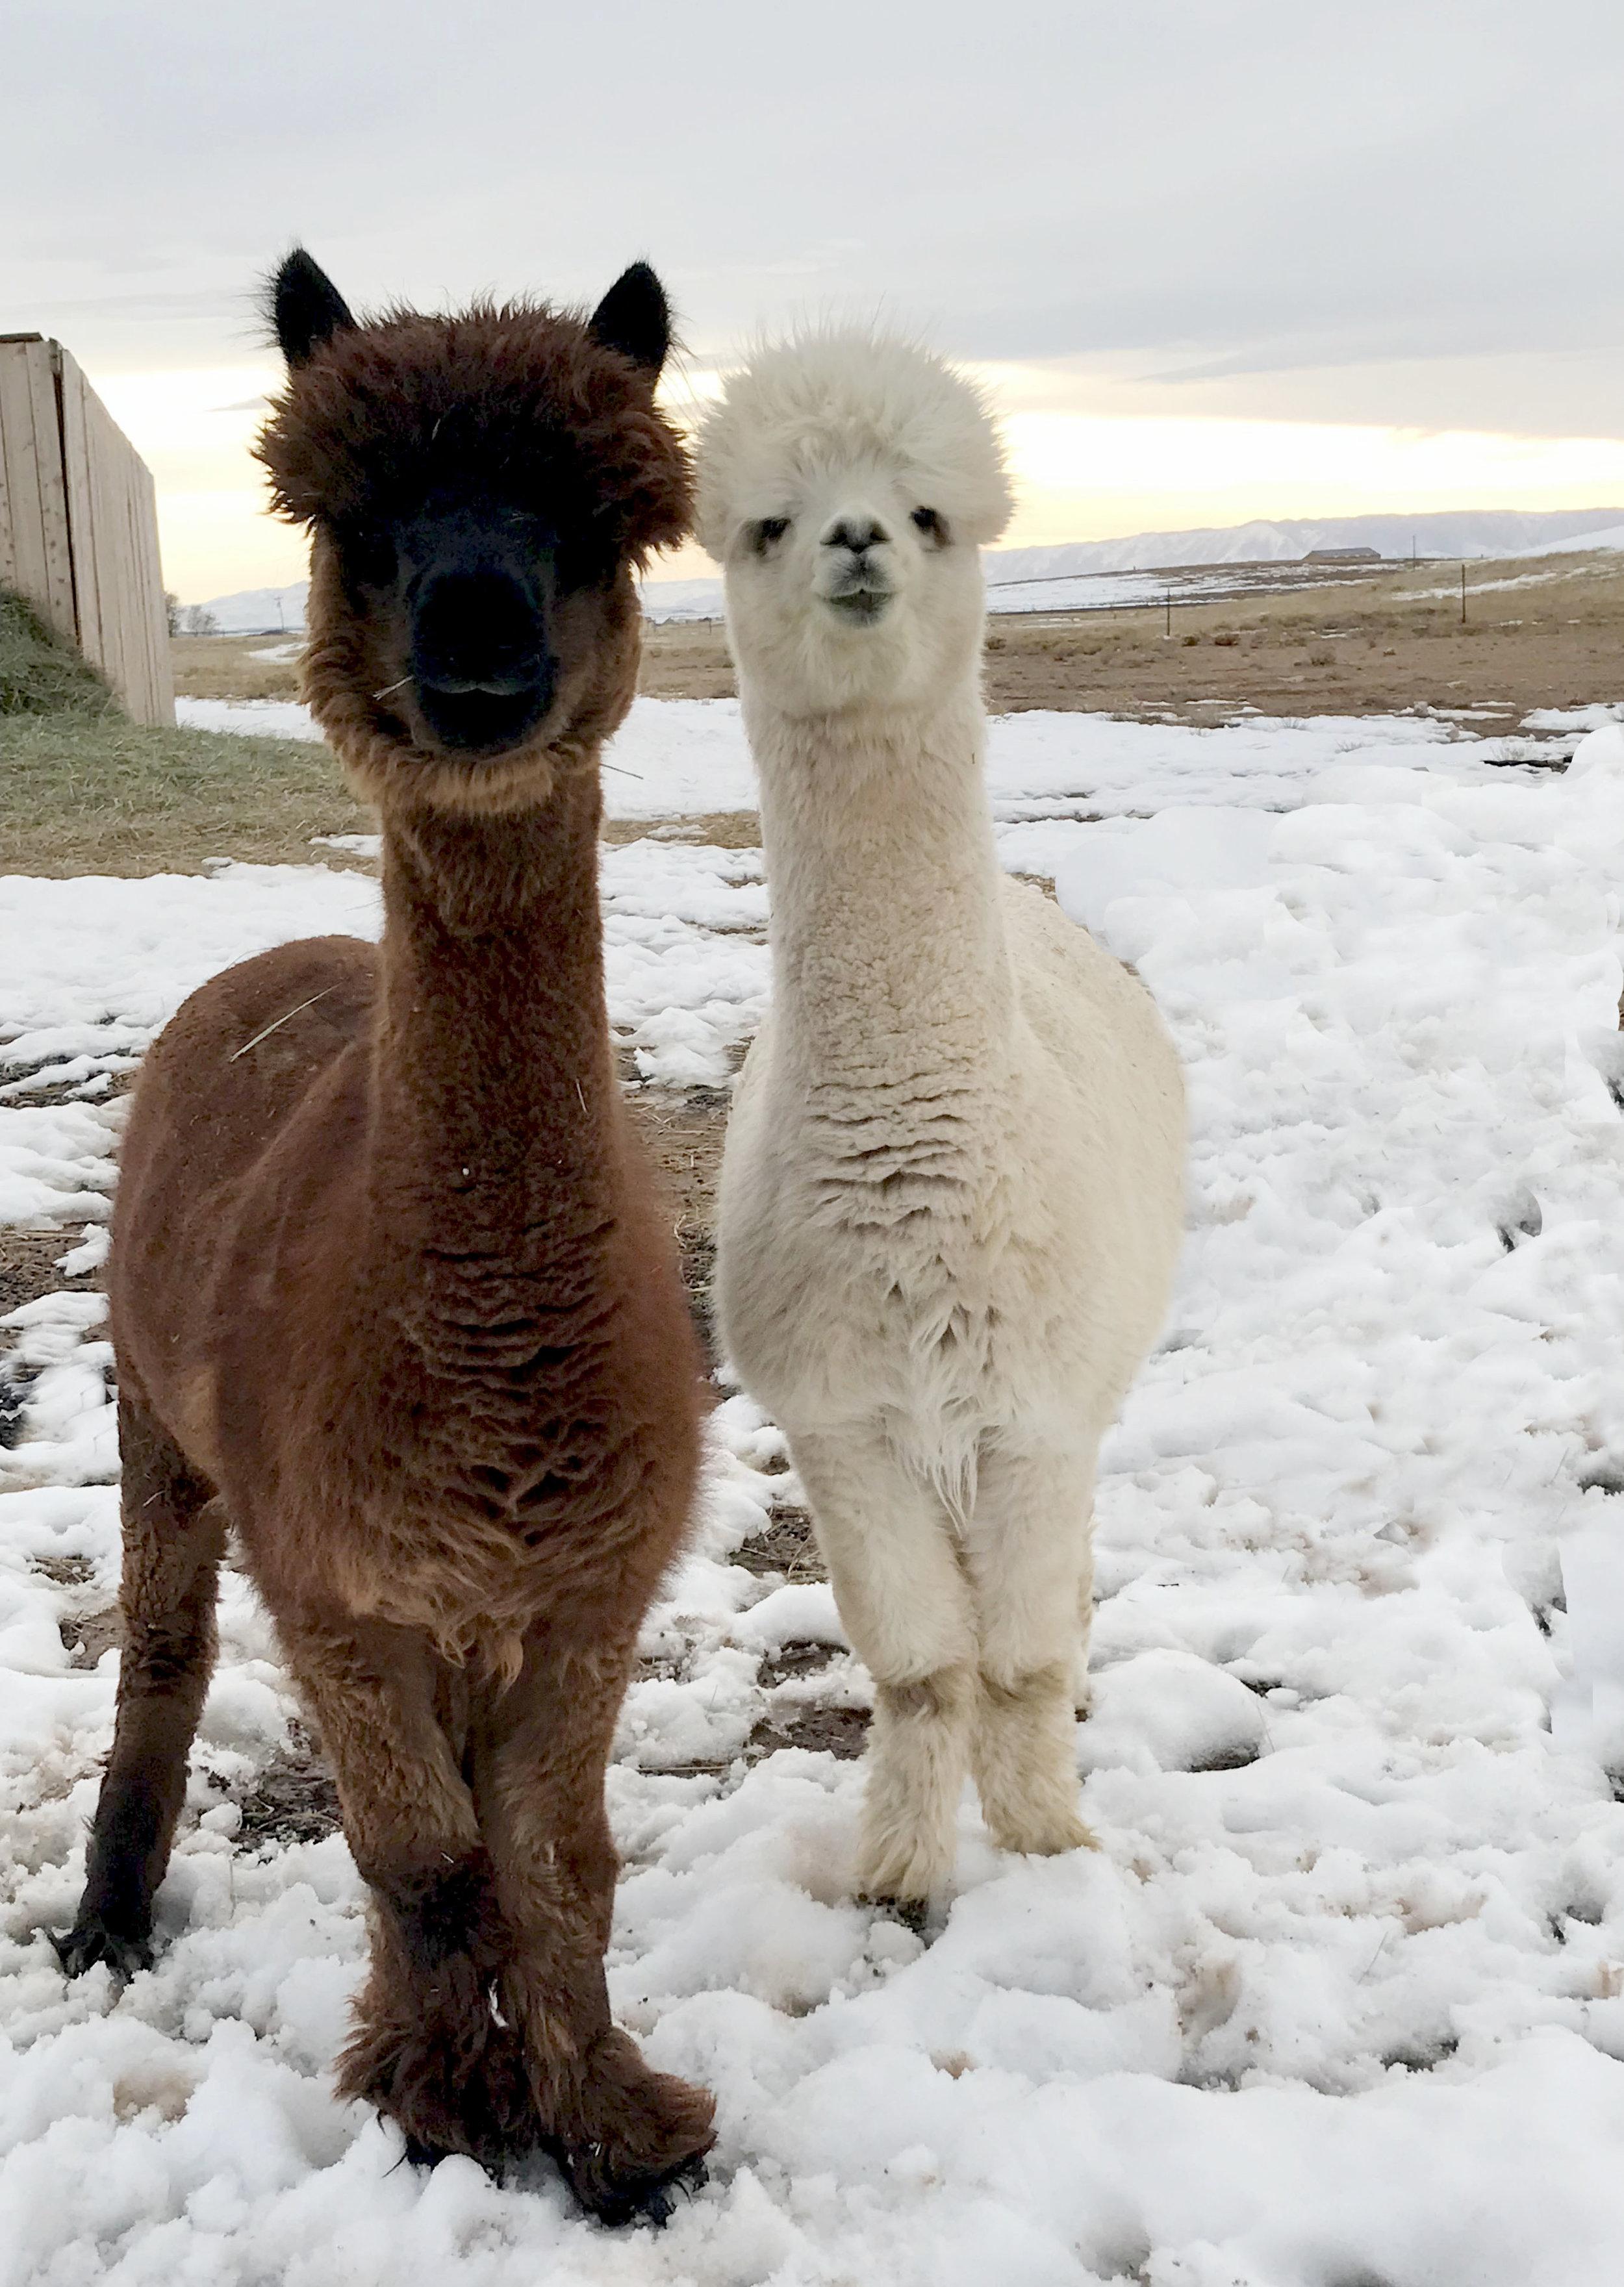 Mondavi Lennon the alpacas